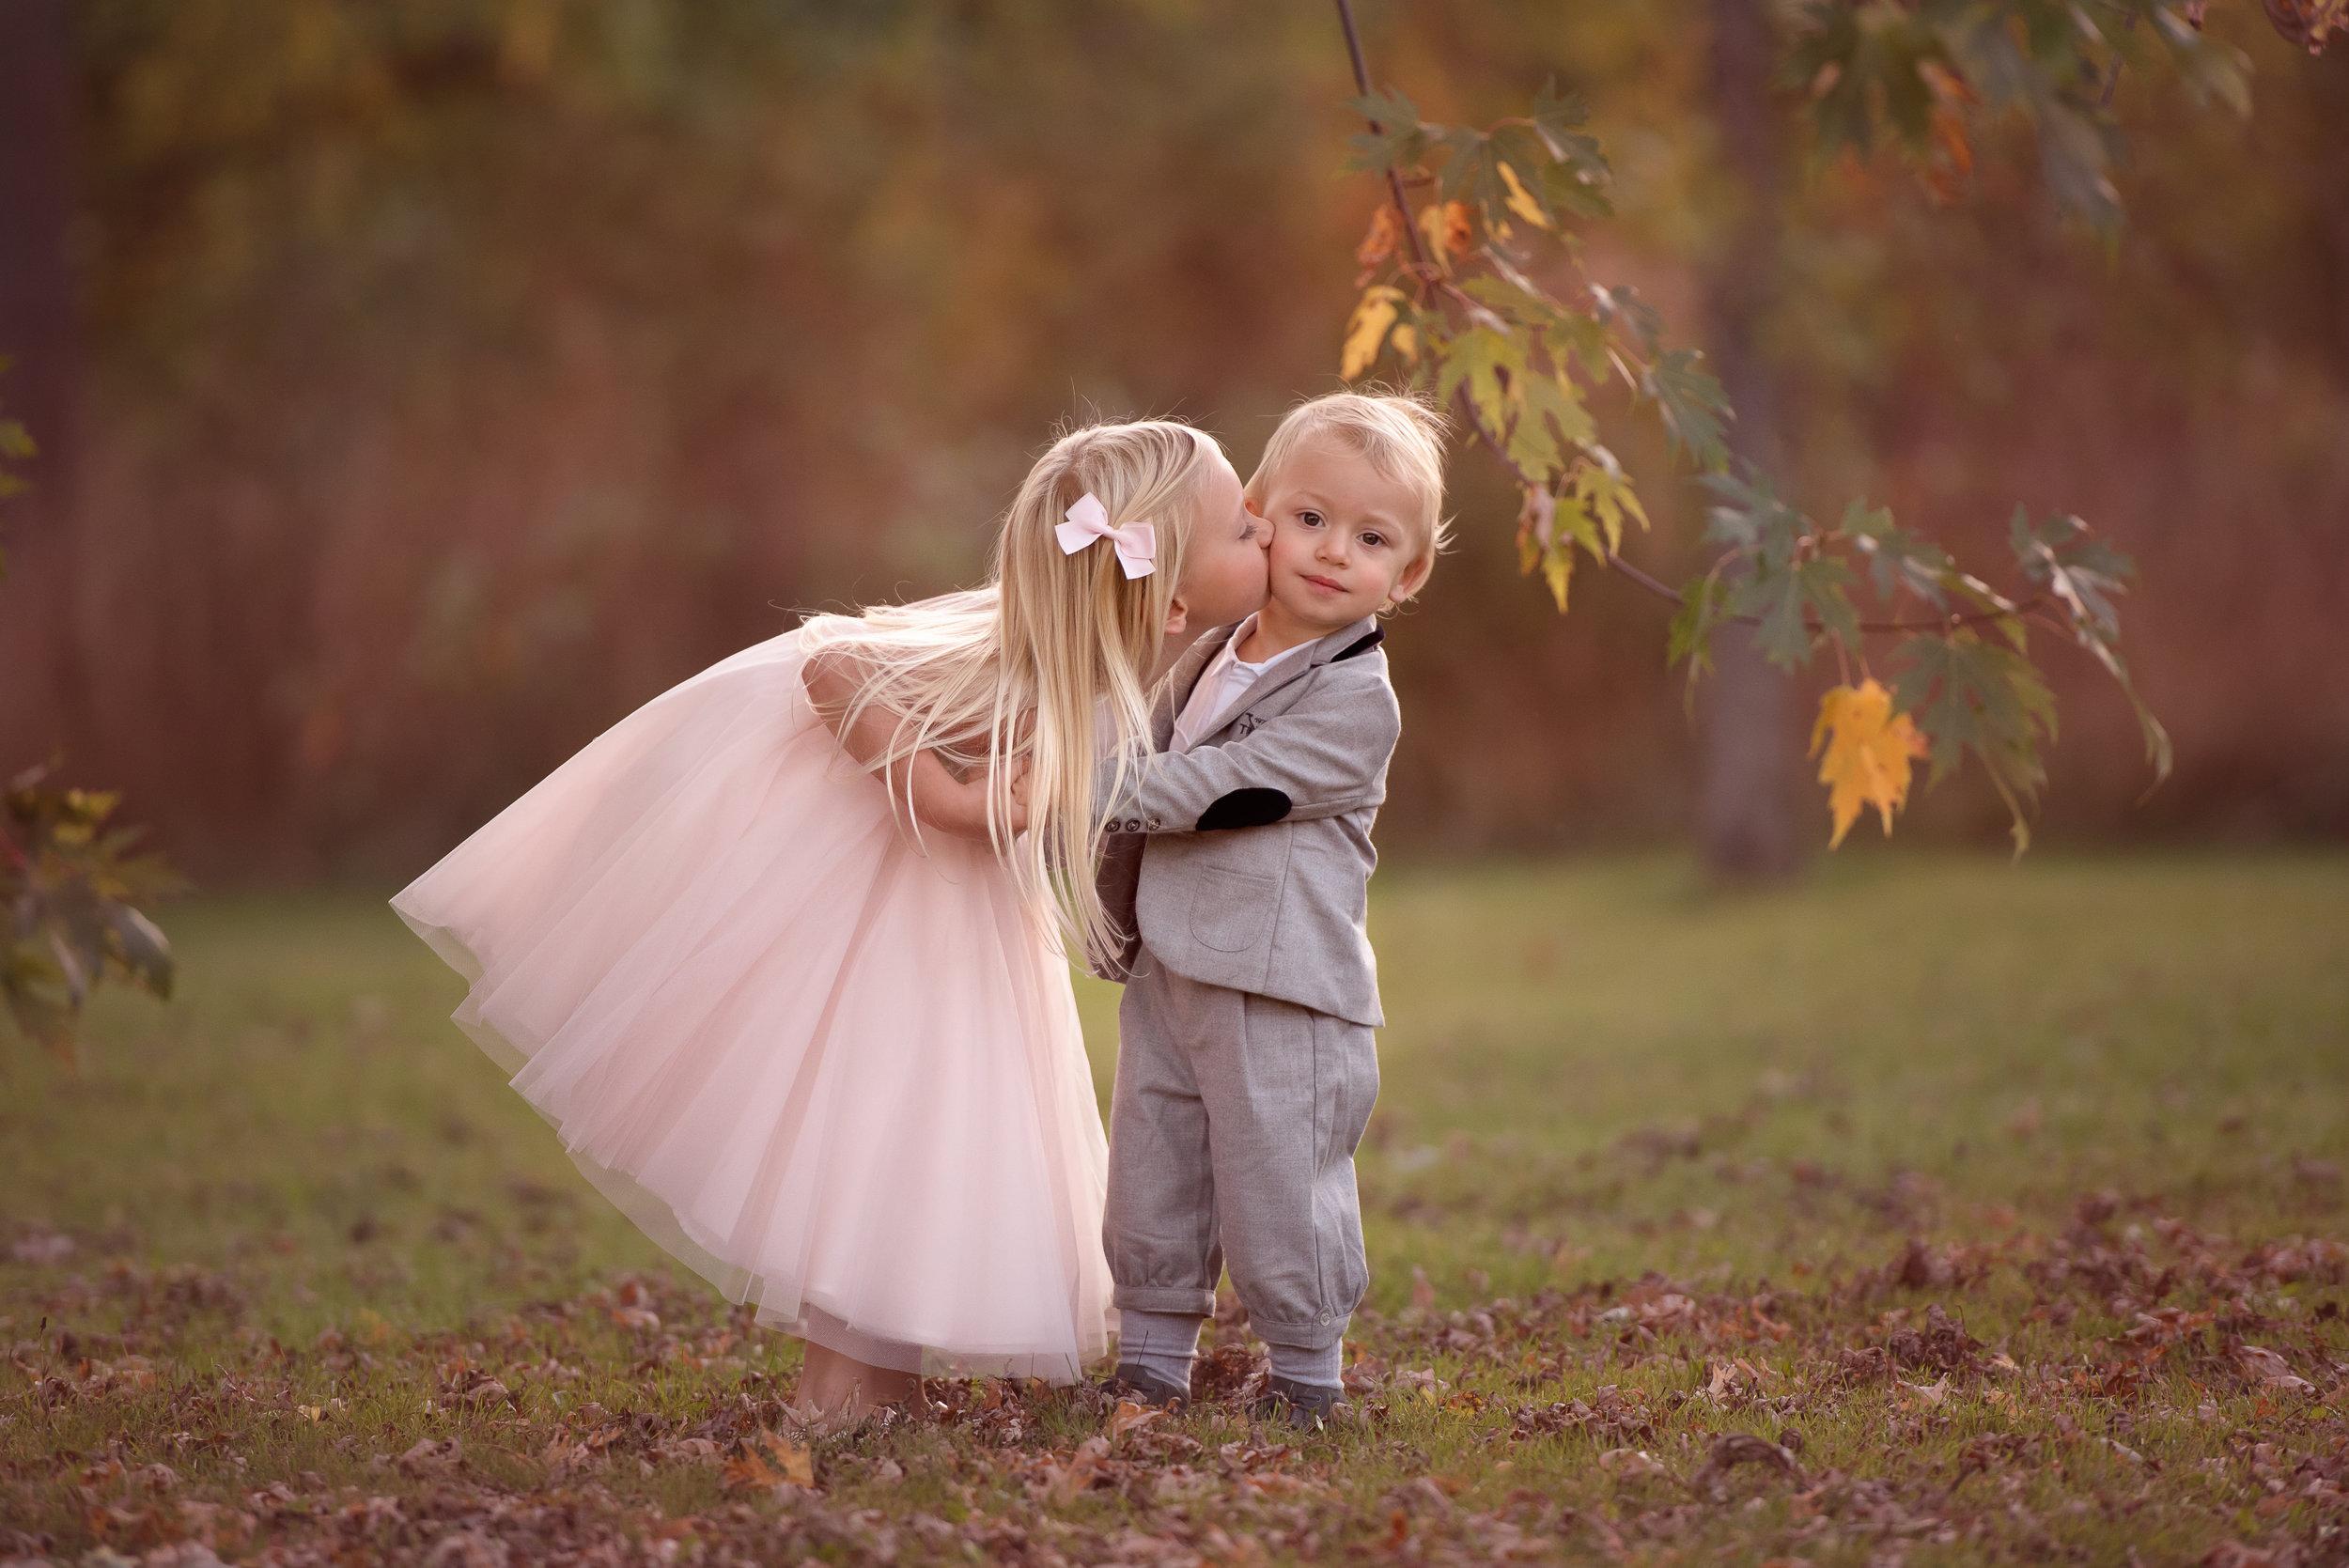 joanna_galant_photography_toronto_children_photographer